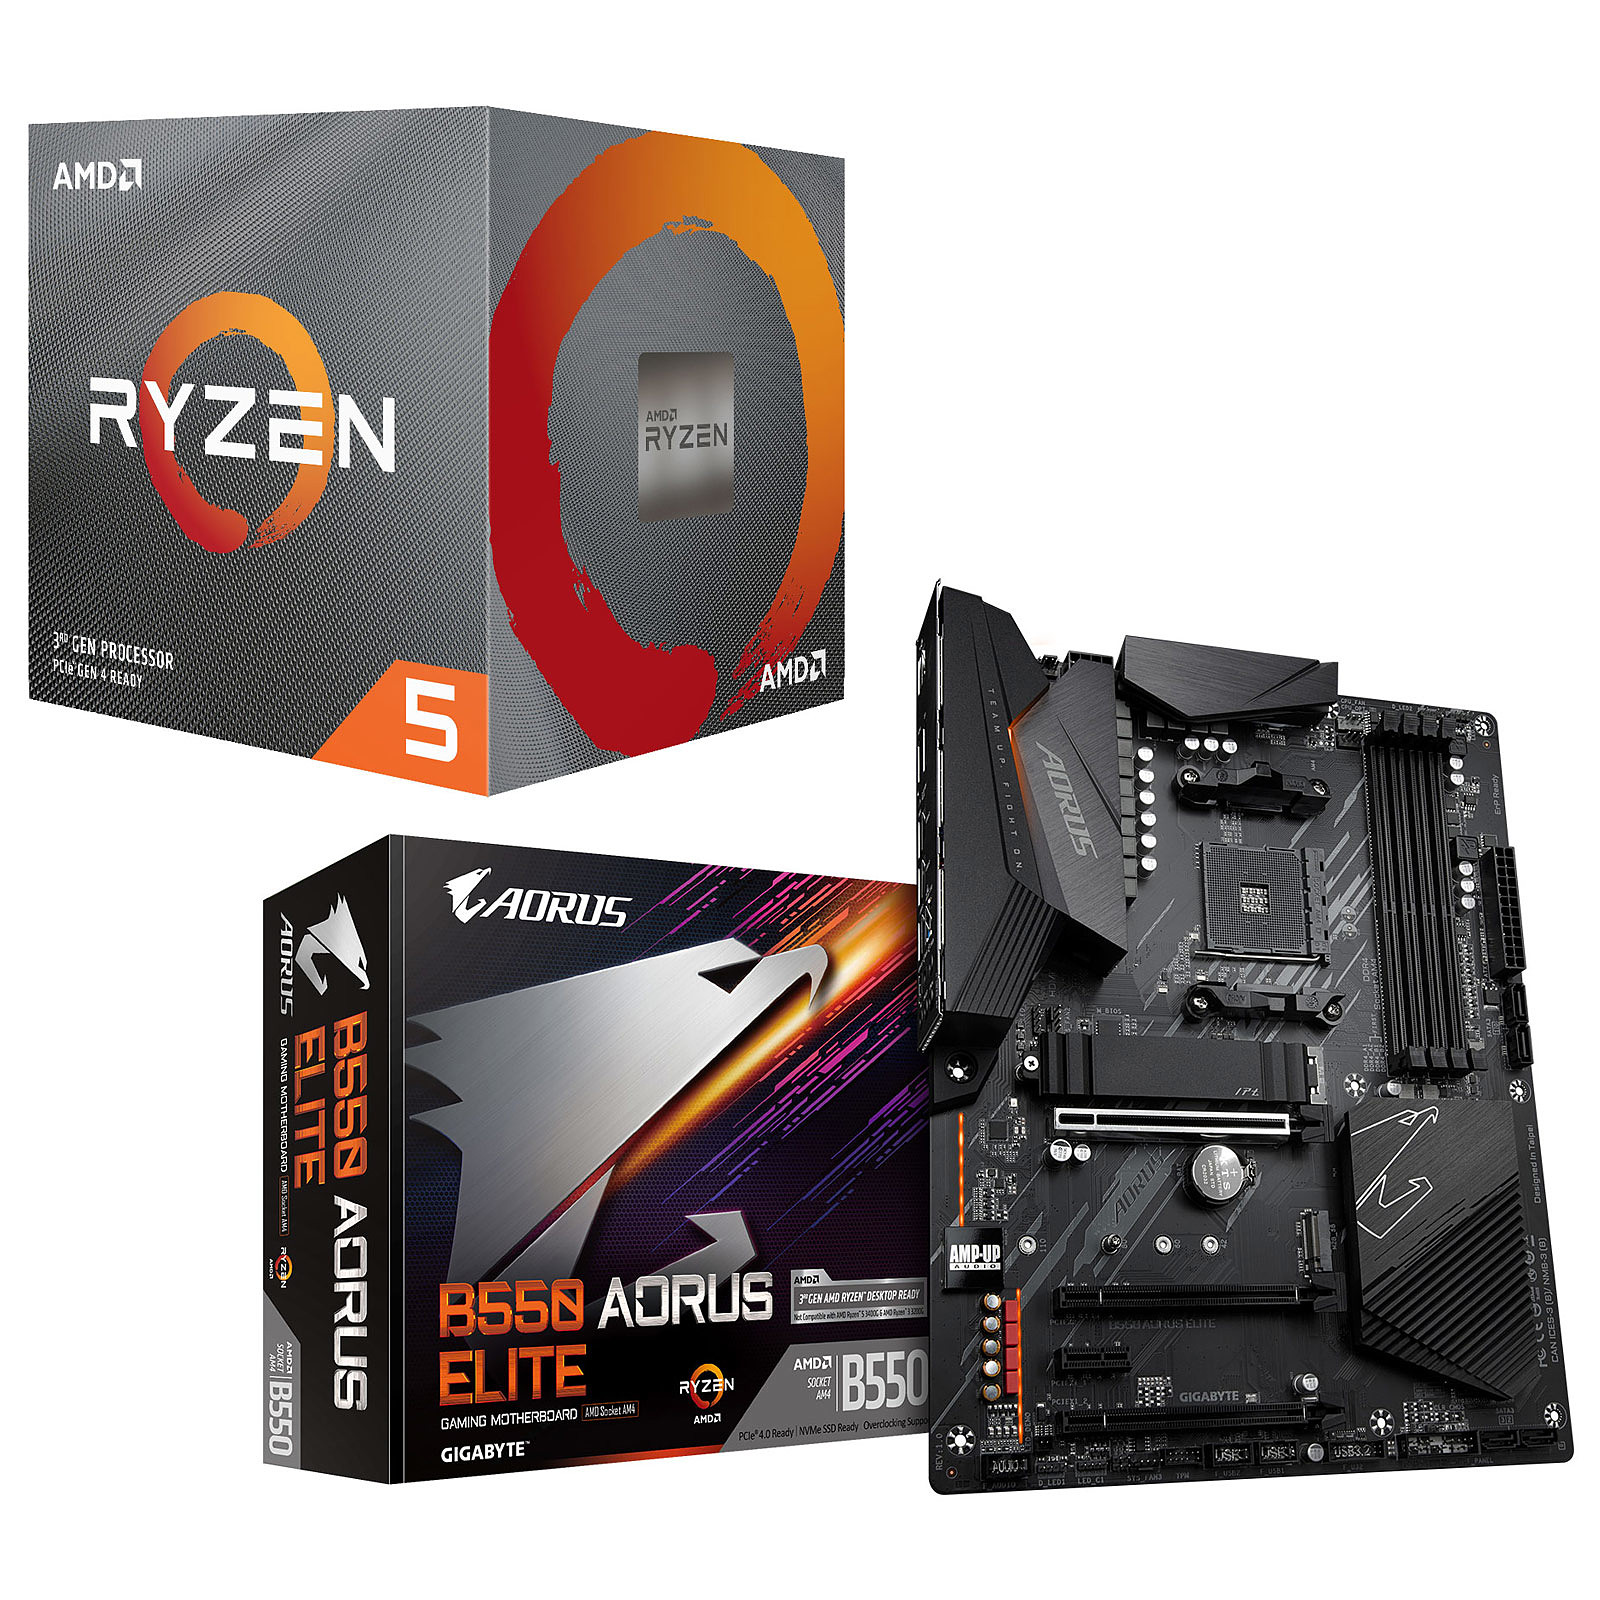 Kit Upgrade PC AMD Ryzen 5 3600 Gigabyte B550 AORUS ELITE